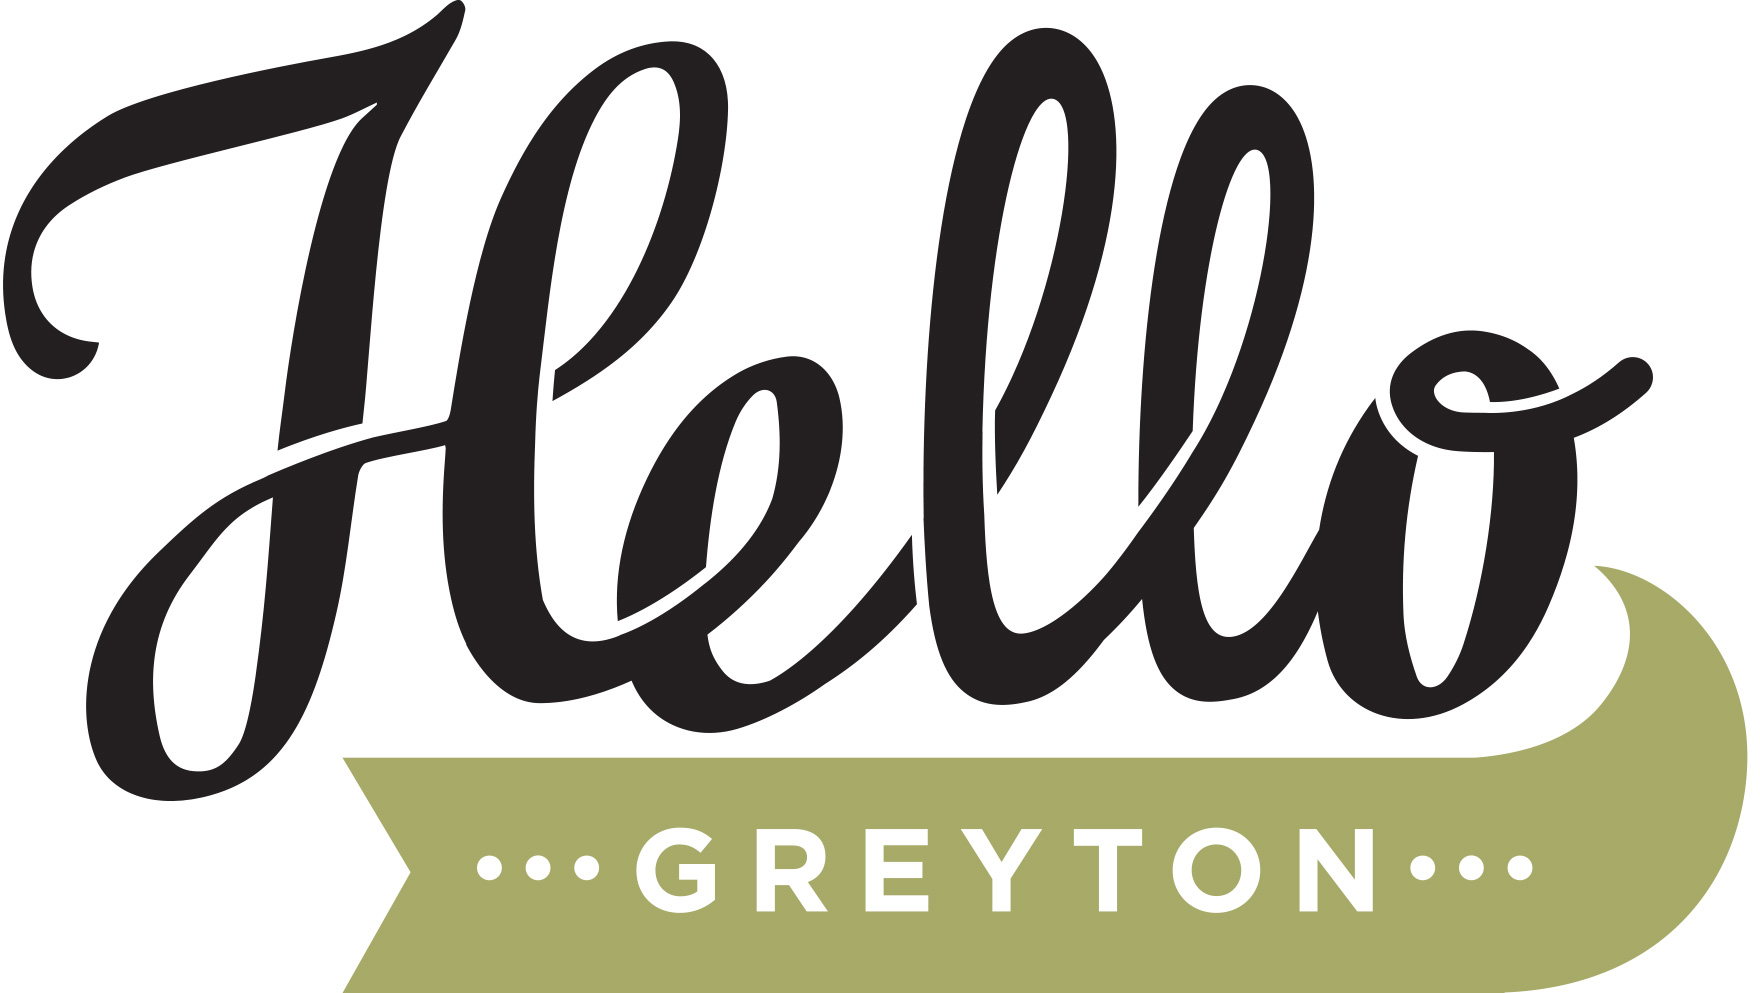 FORMAL-Hello-Greyton.jpg